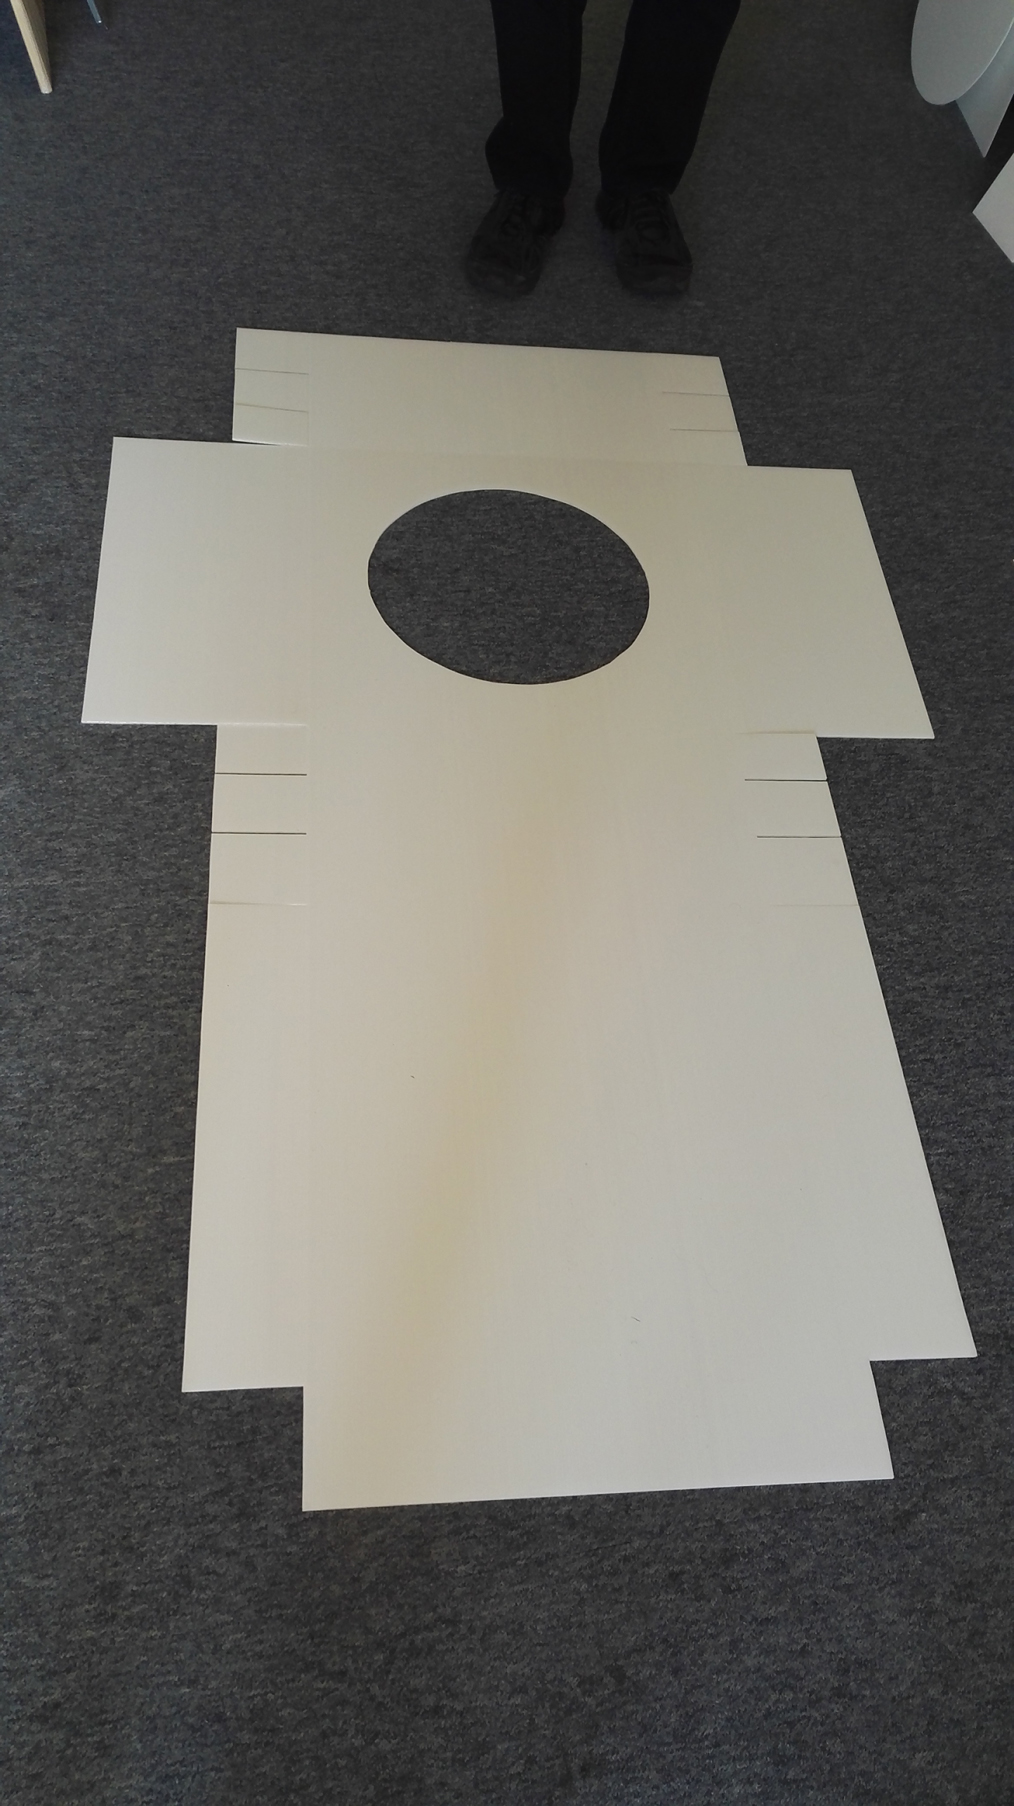 Flat_Box_01-s1